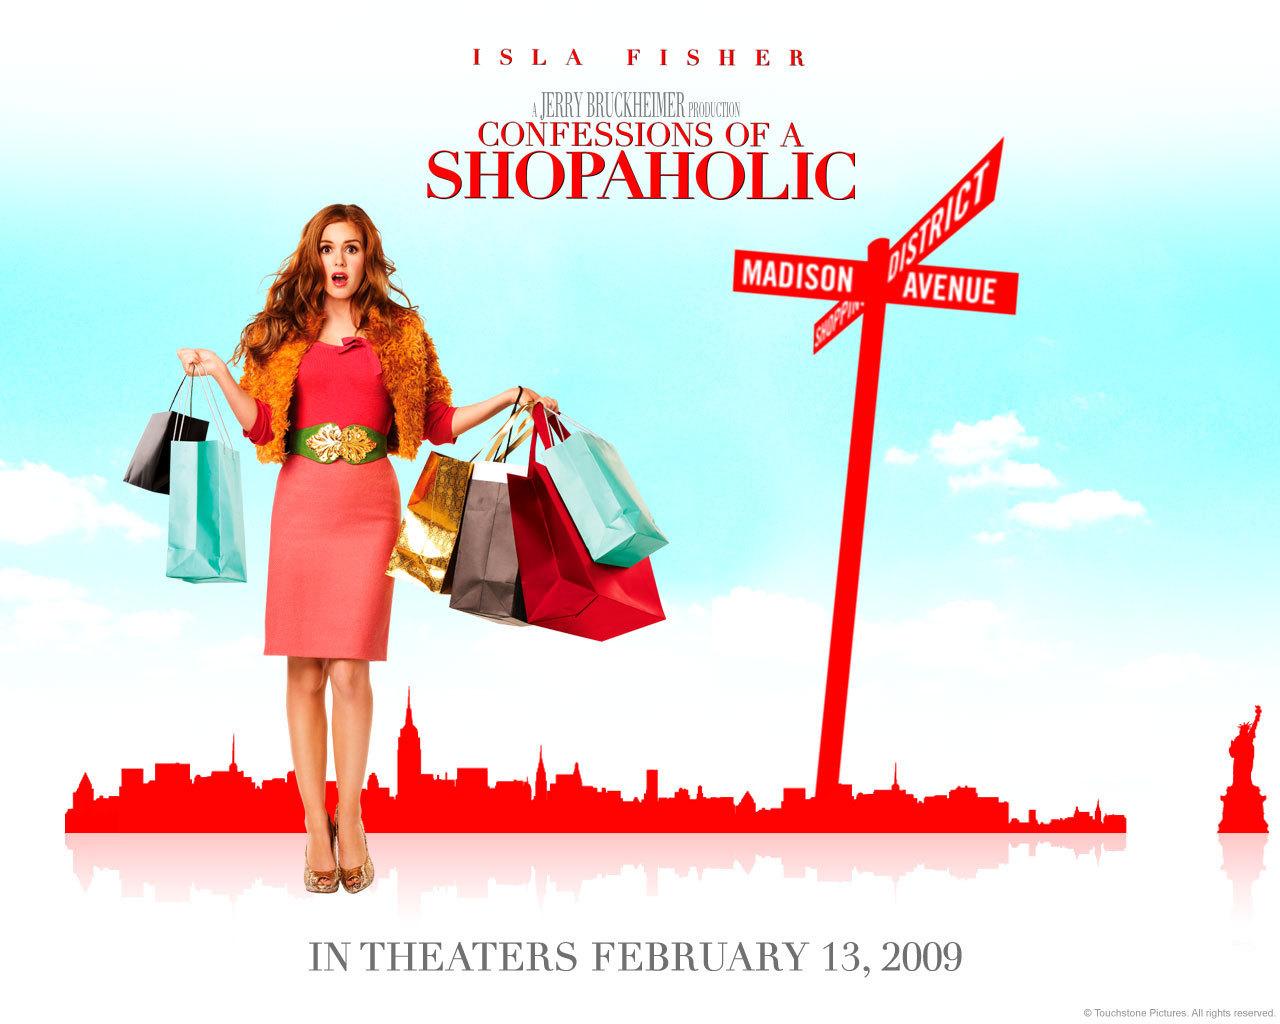 http://4.bp.blogspot.com/_6fY6t5LlXMQ/THRBZqz7JNI/AAAAAAAAABo/XwFTx4RRK2o/s1600/Shopaholic-Wallpaper-confessions-of-a-shopaholic-movie-3787136-1280-1024.jpg